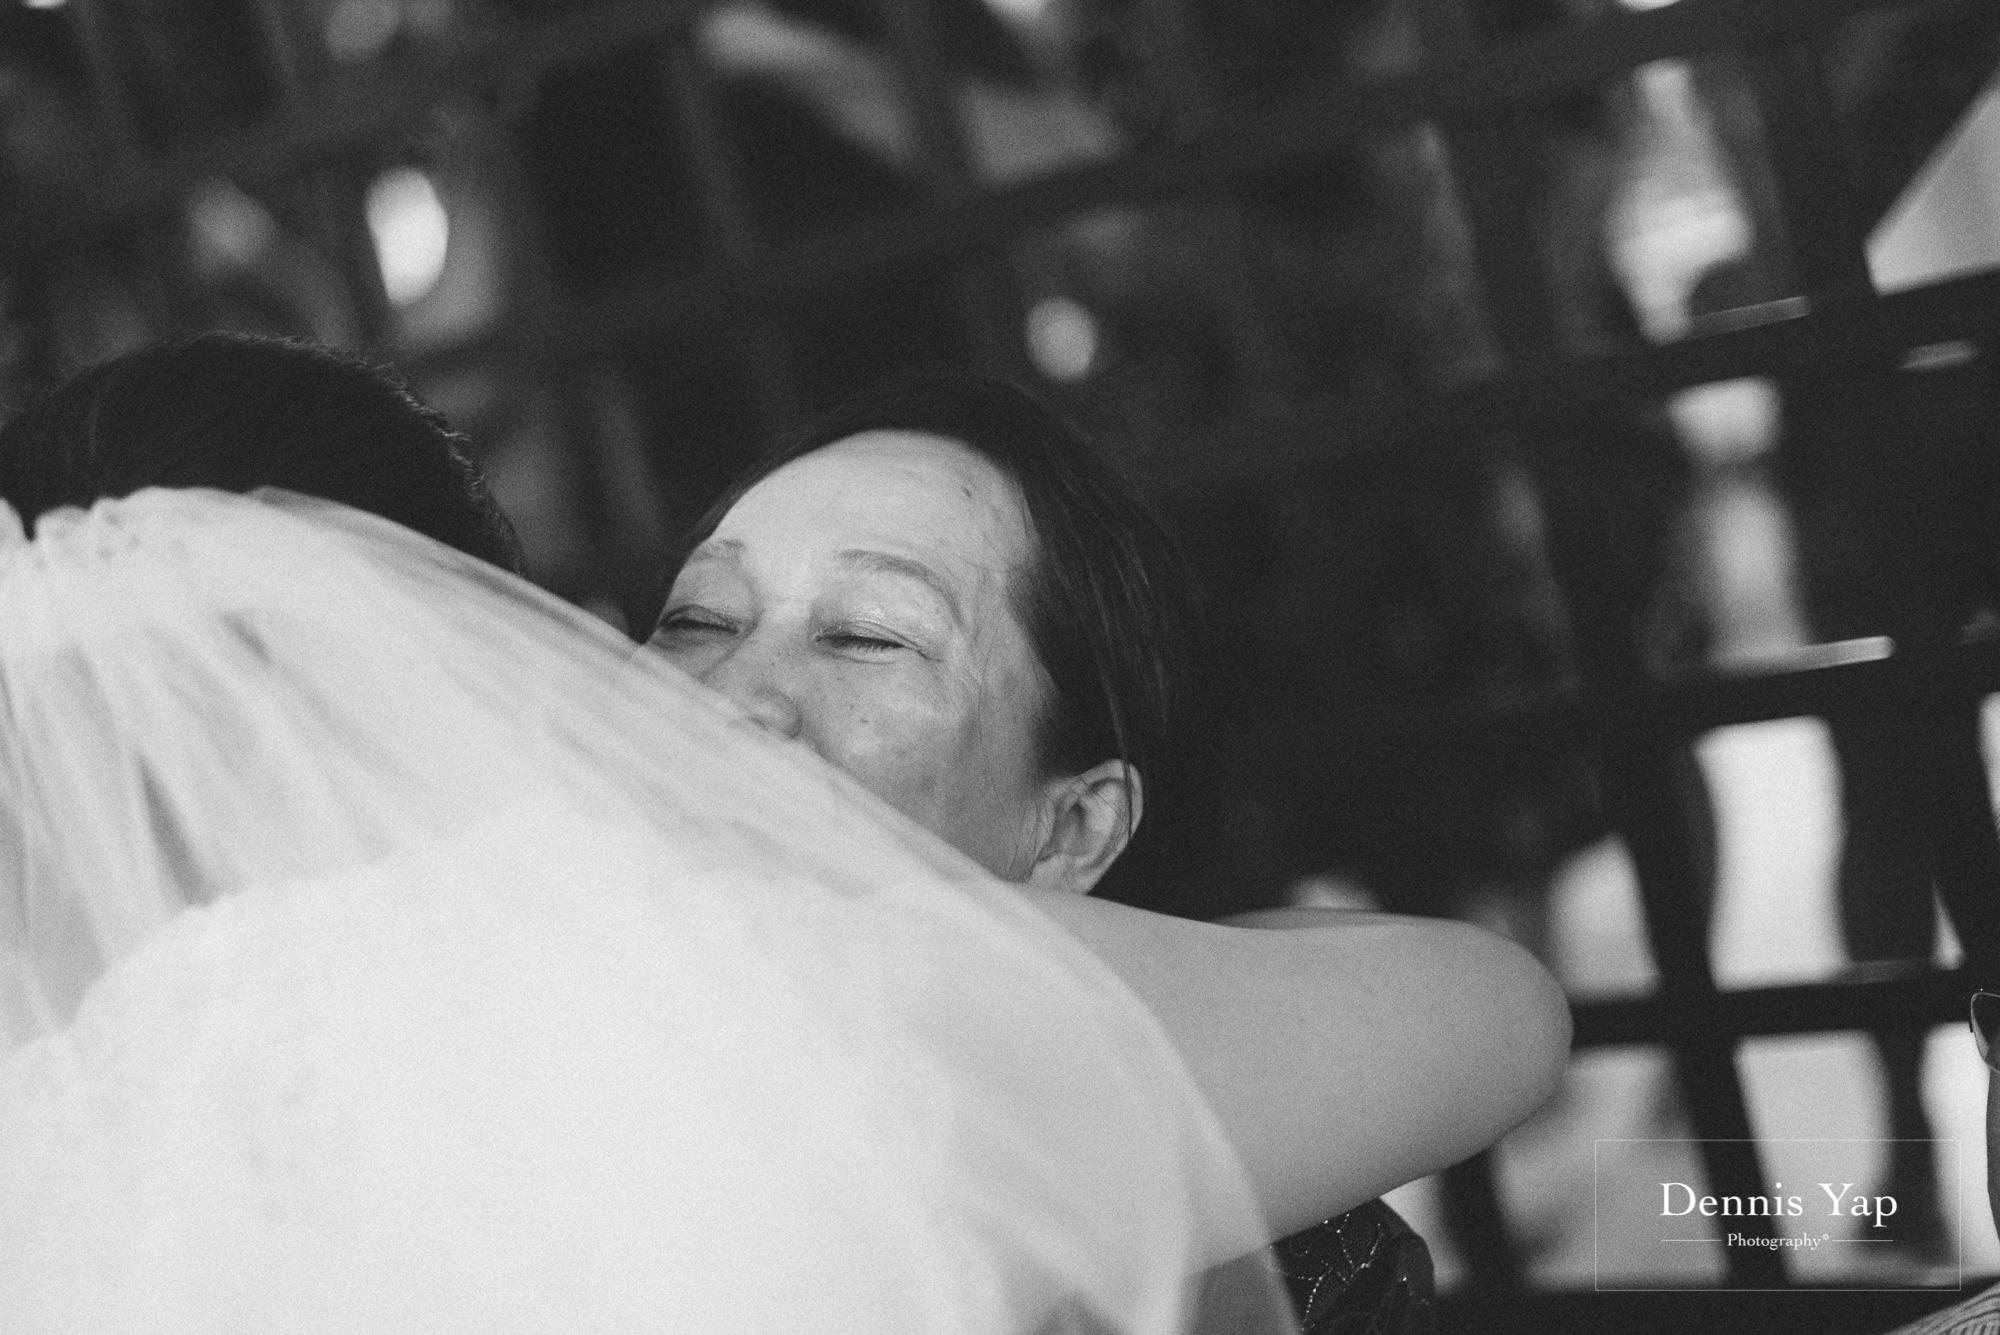 ino sheri black white church wedding st thomas more subang jaya dennis yap photography touching love beloved australia indonesia-15.jpg